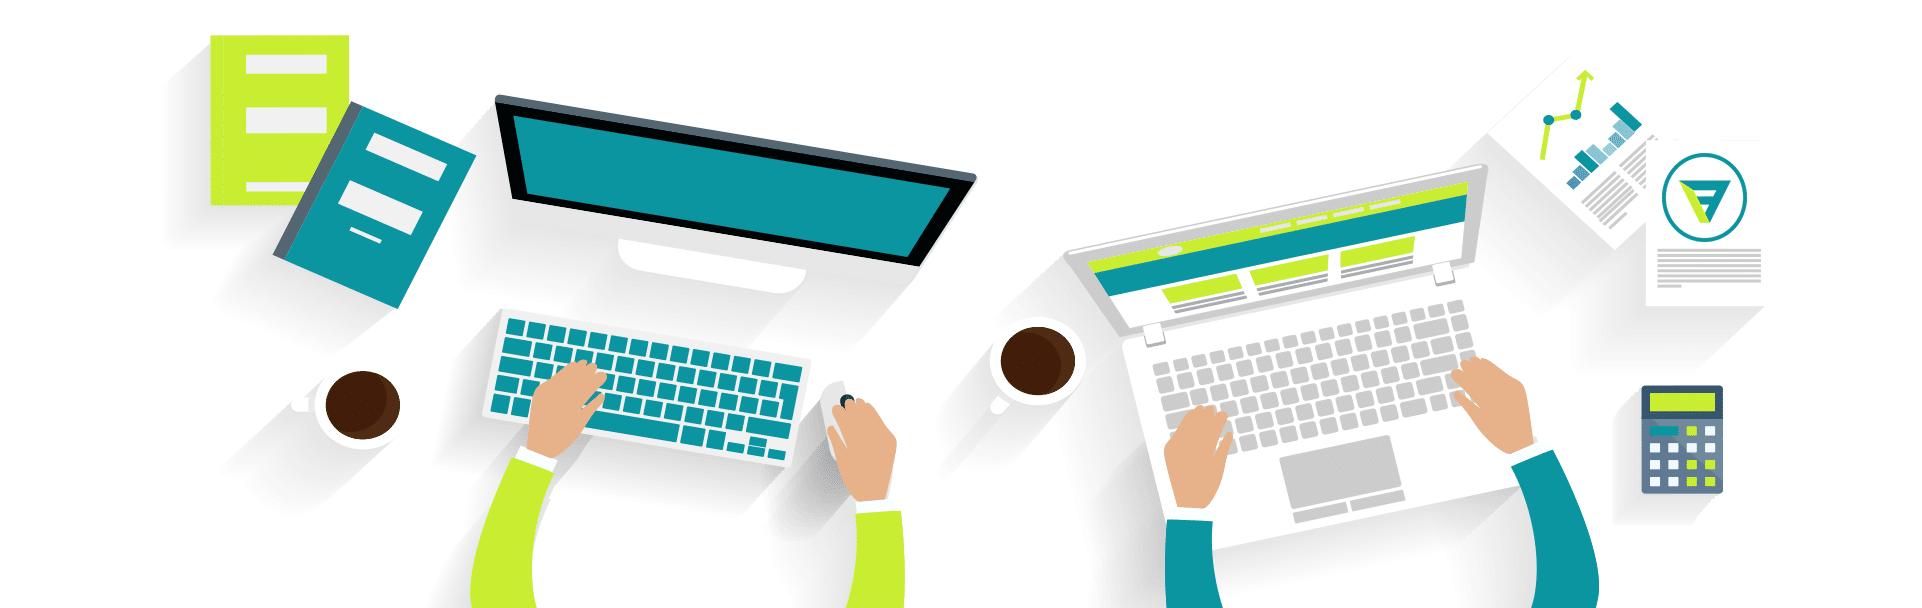 ideas en línea de negocios en línea